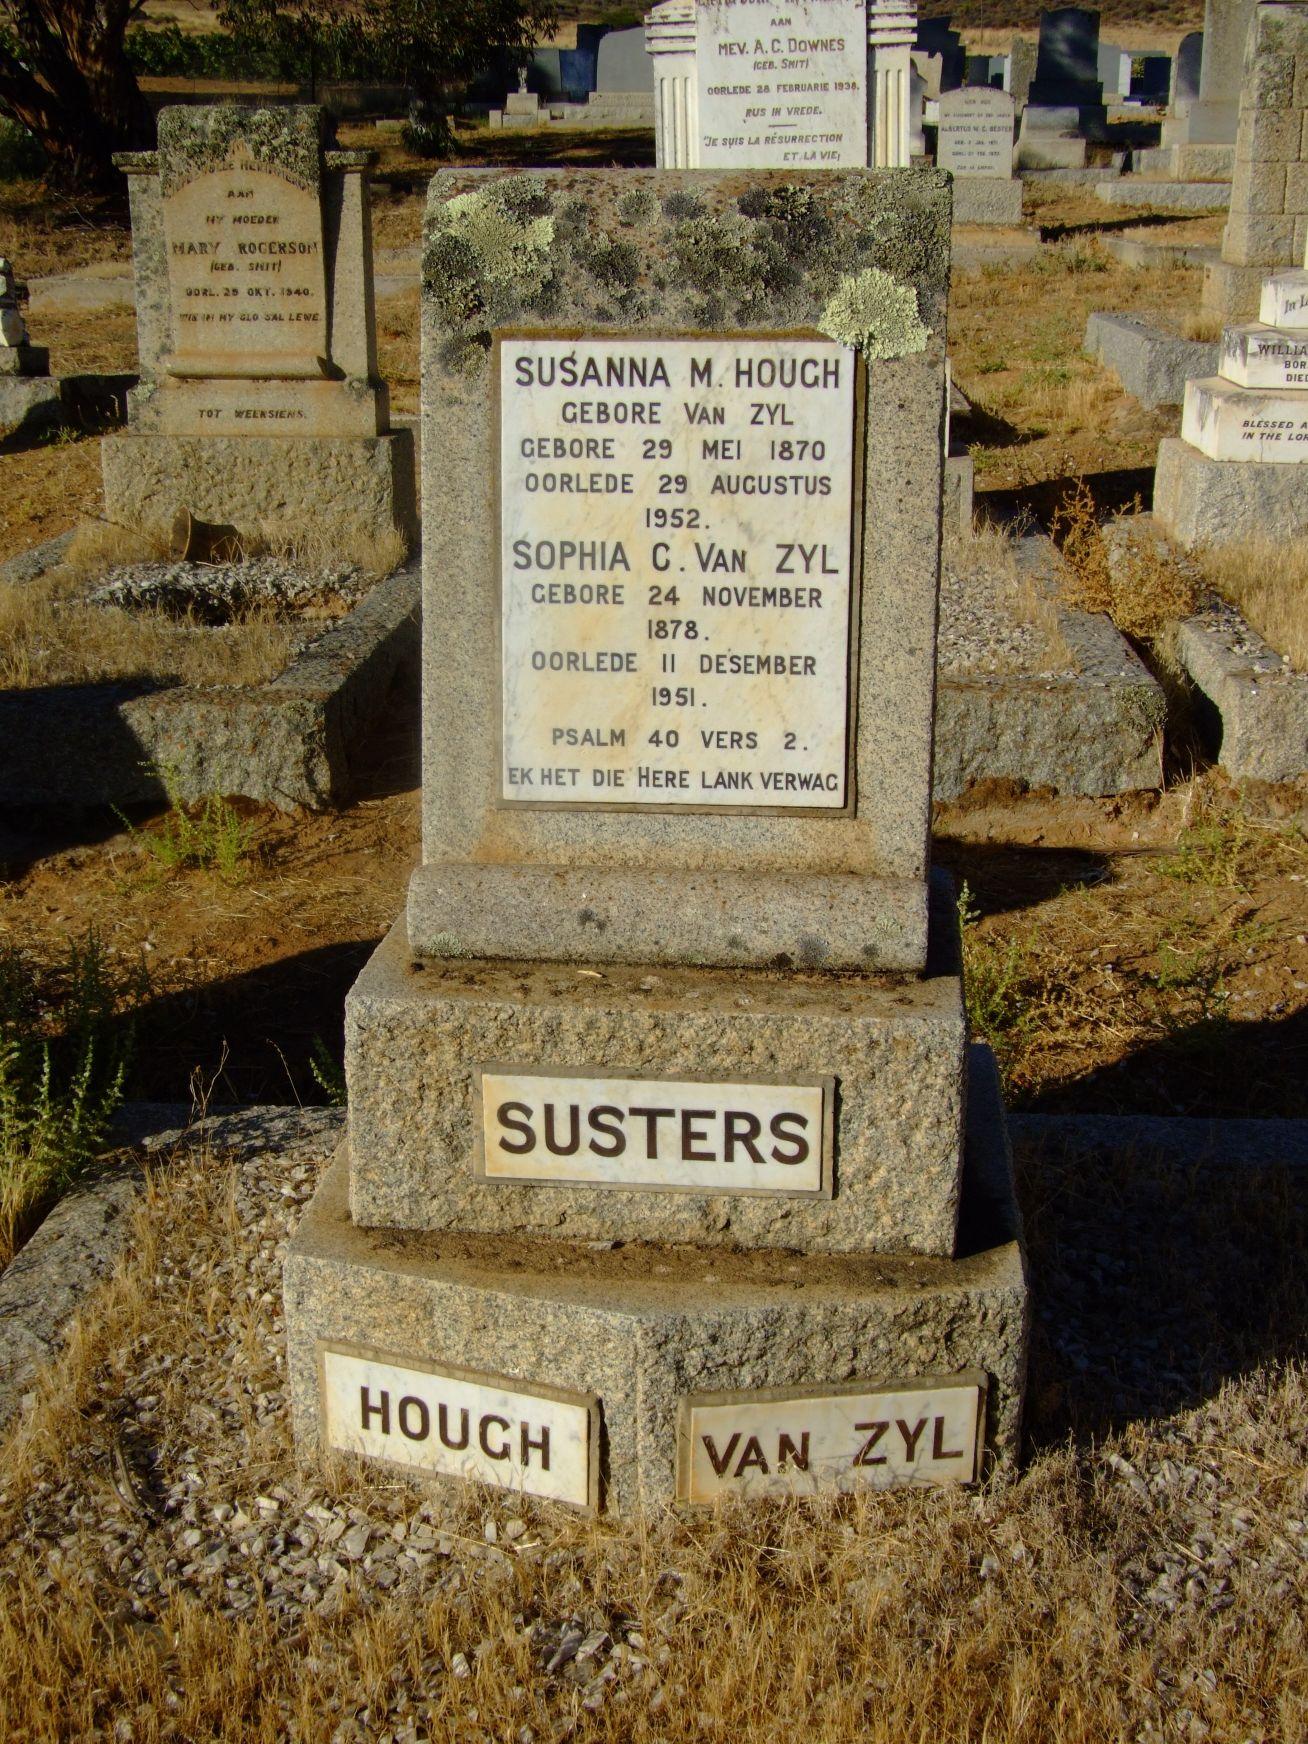 Hough, Susanna M. + Van Zyl, Sophia C.